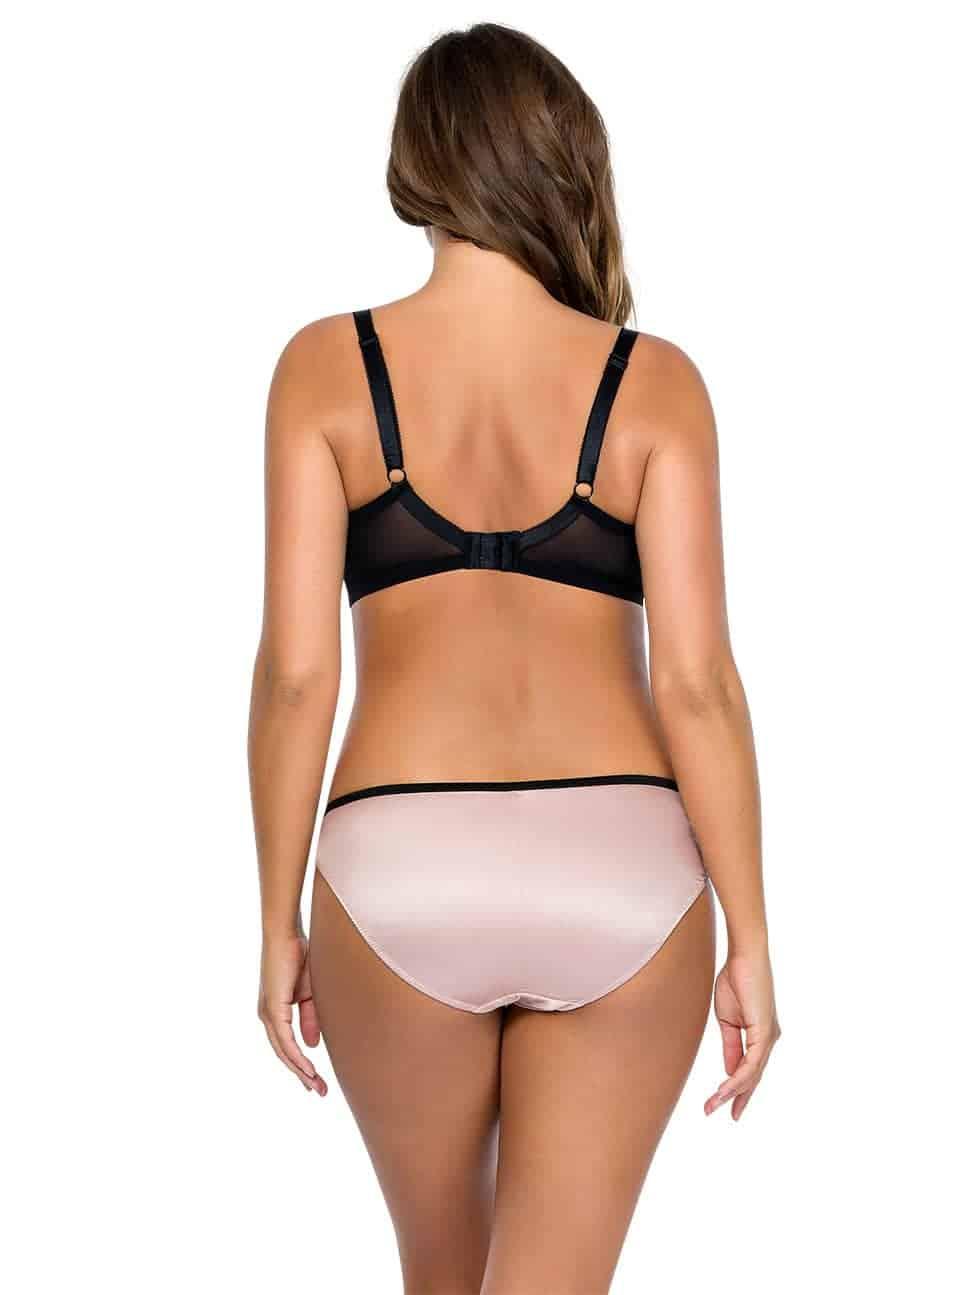 Charlotte BalconetBra6931 Bikini6905 DusyRoseBlack Back - Charlotte Bikini - Dusty Rose w Black - 6905